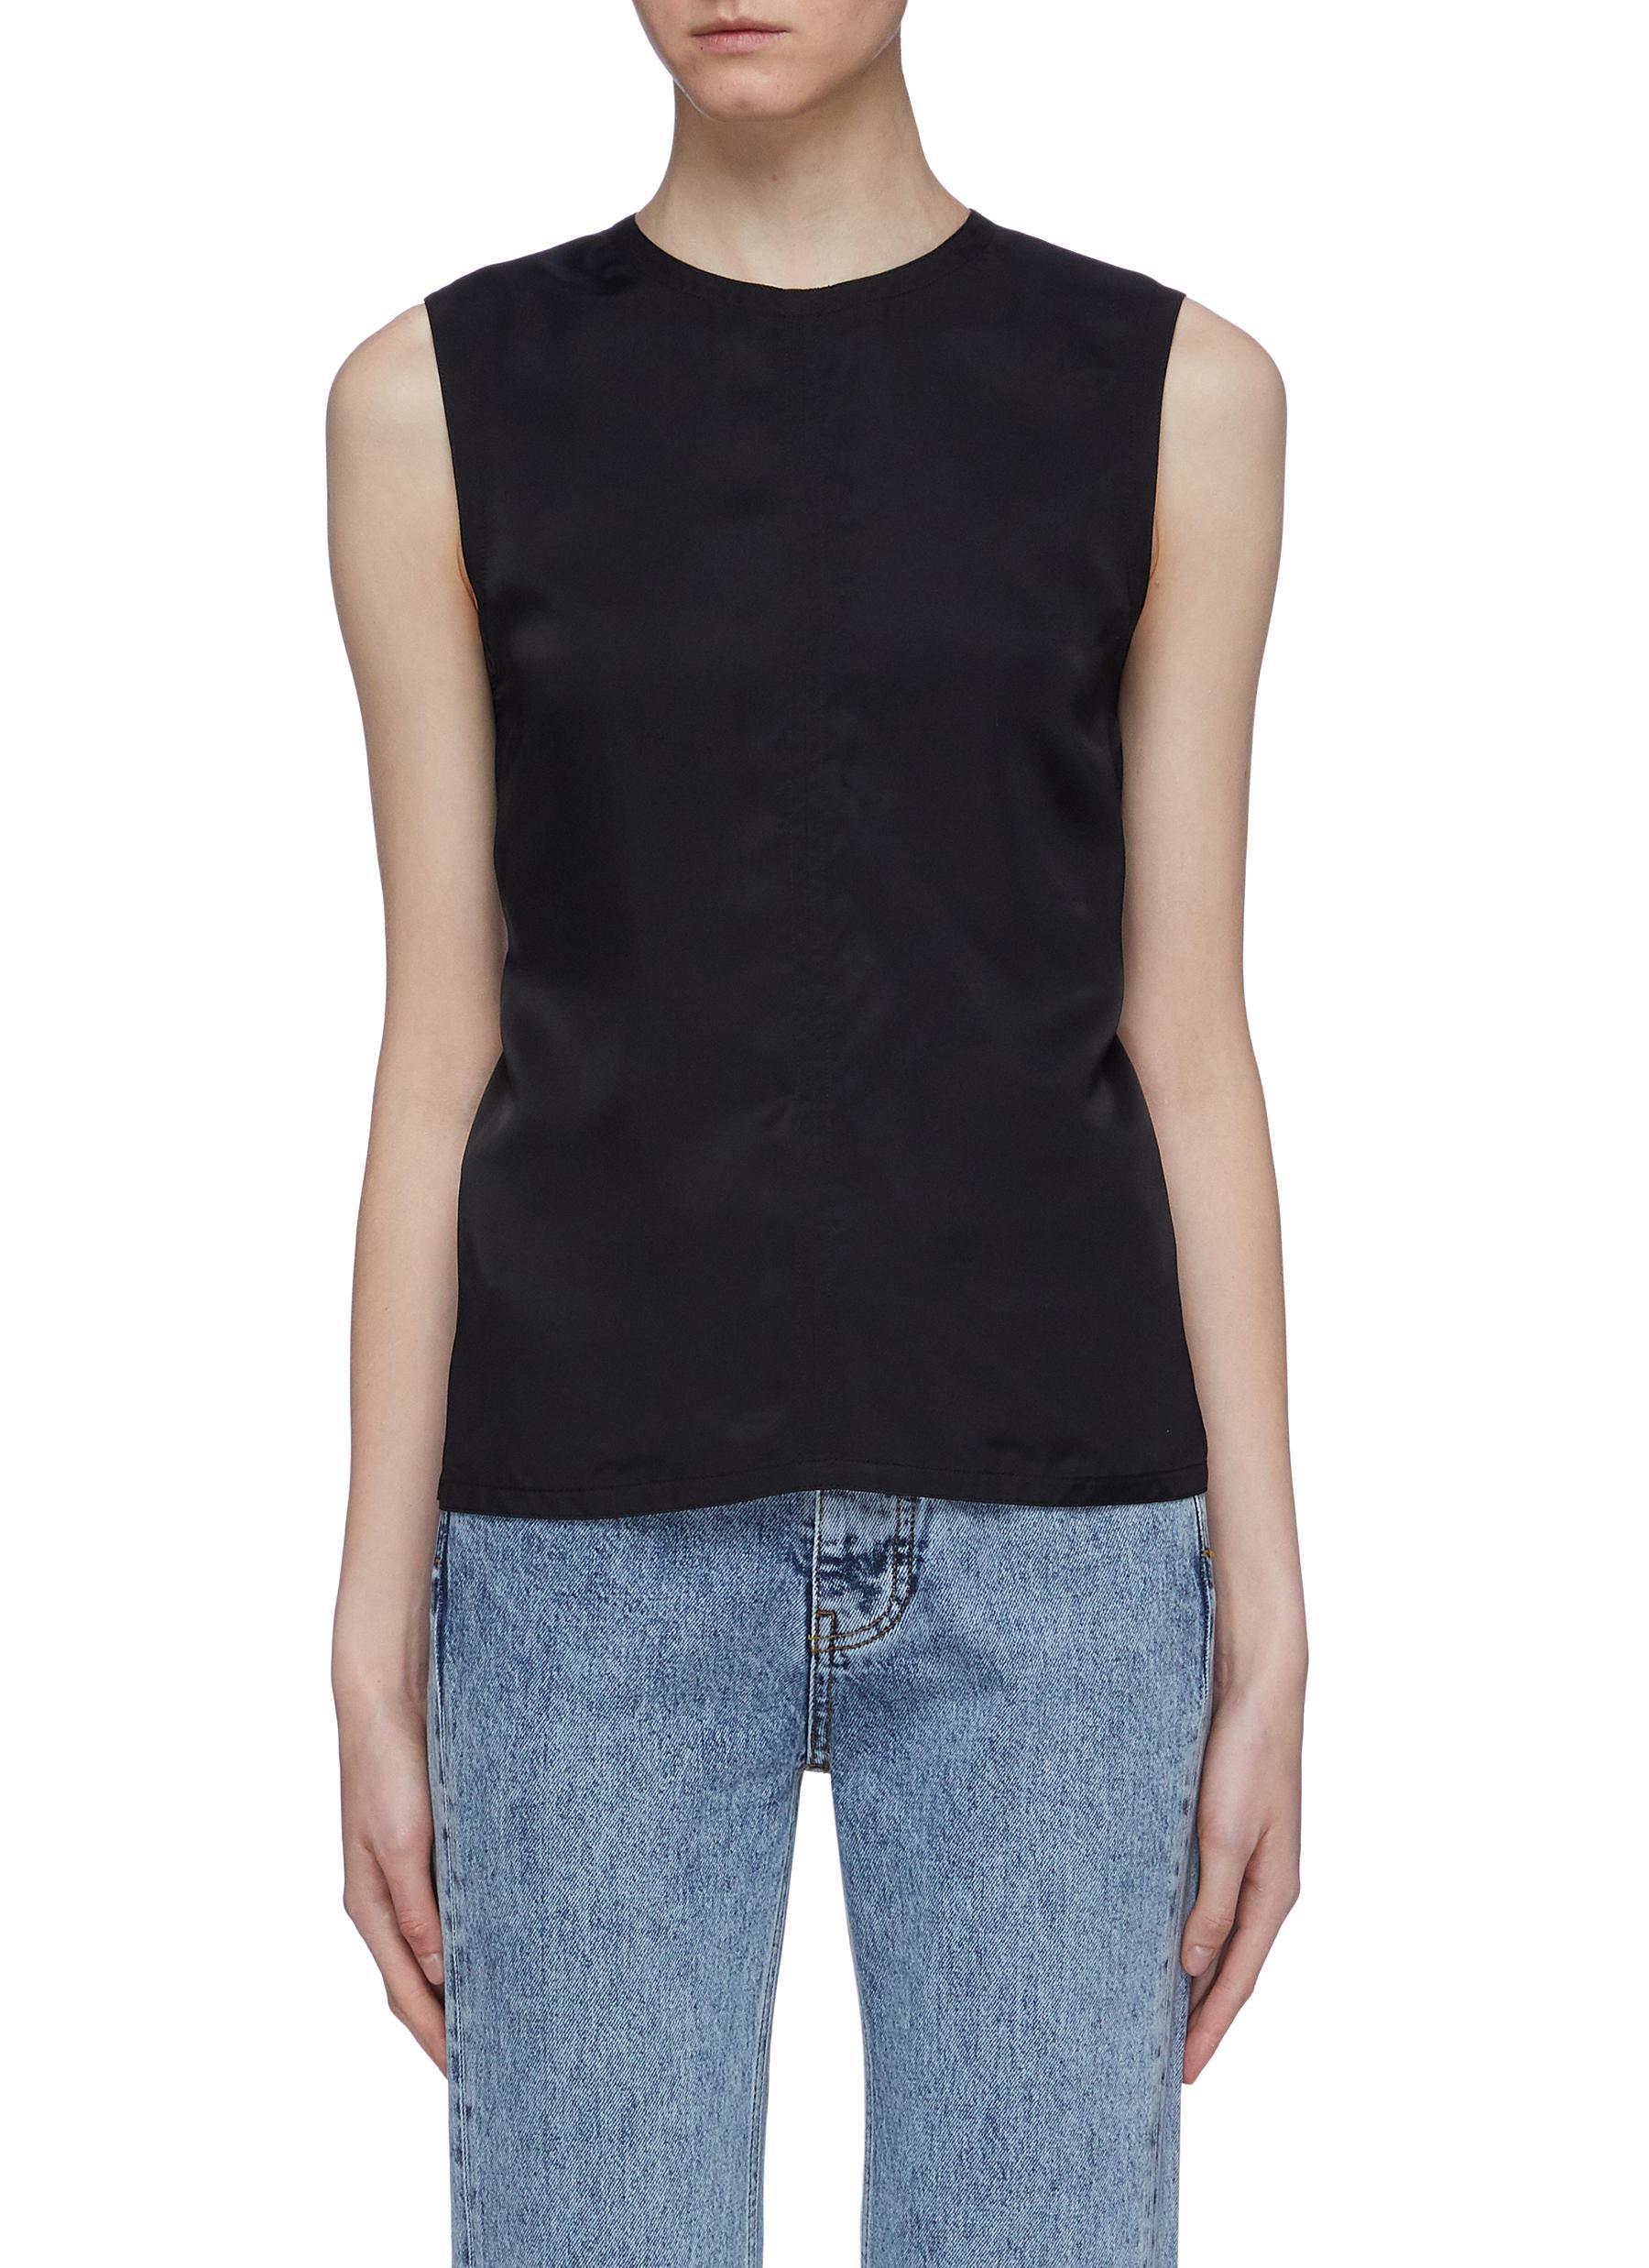 Cutout open back sleeveless top by Helmut Lang